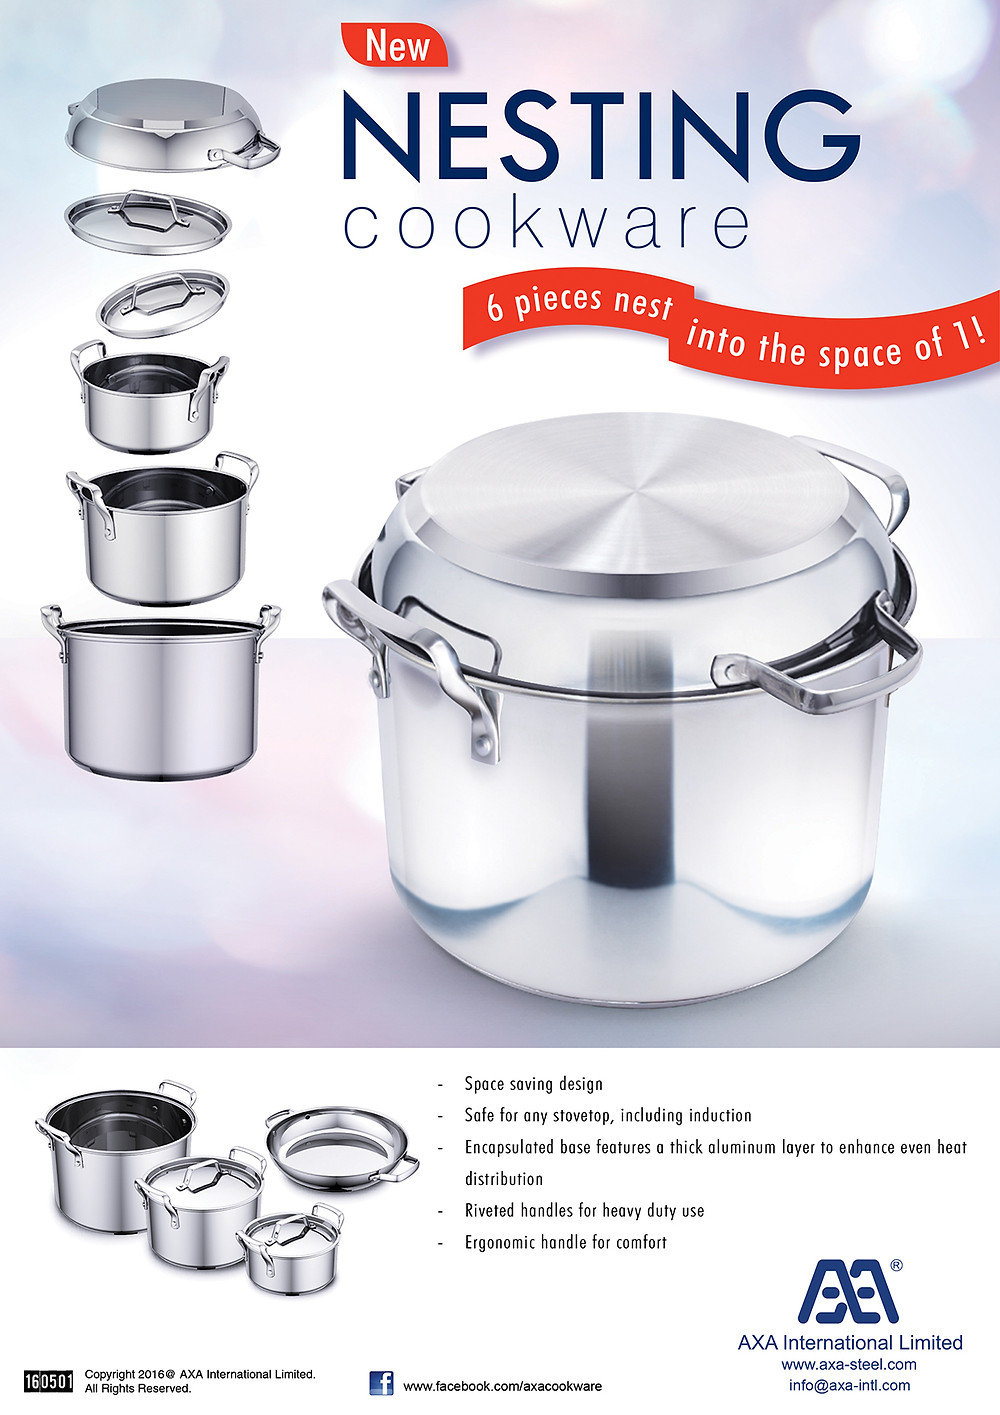 Nesting cookware